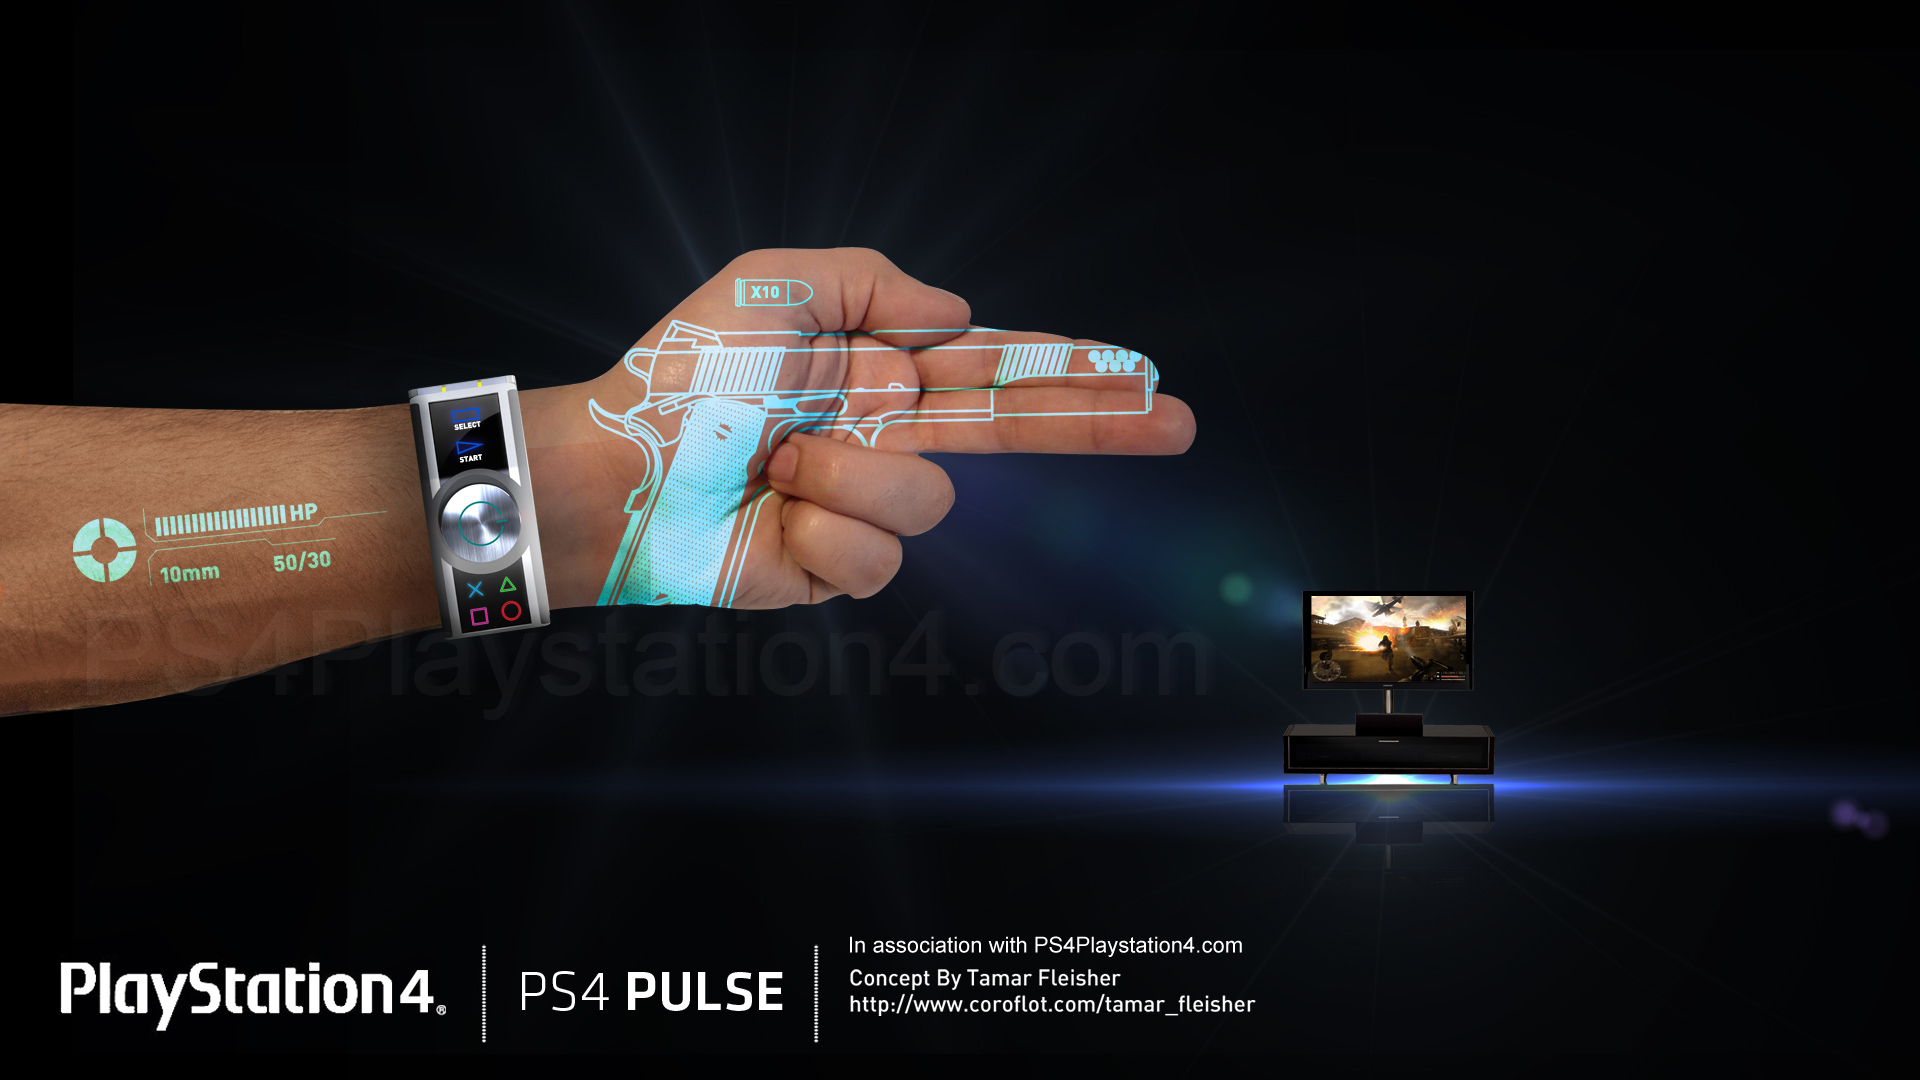 Wallpaper download ps4 - Make It Your Desktop Wallpaper